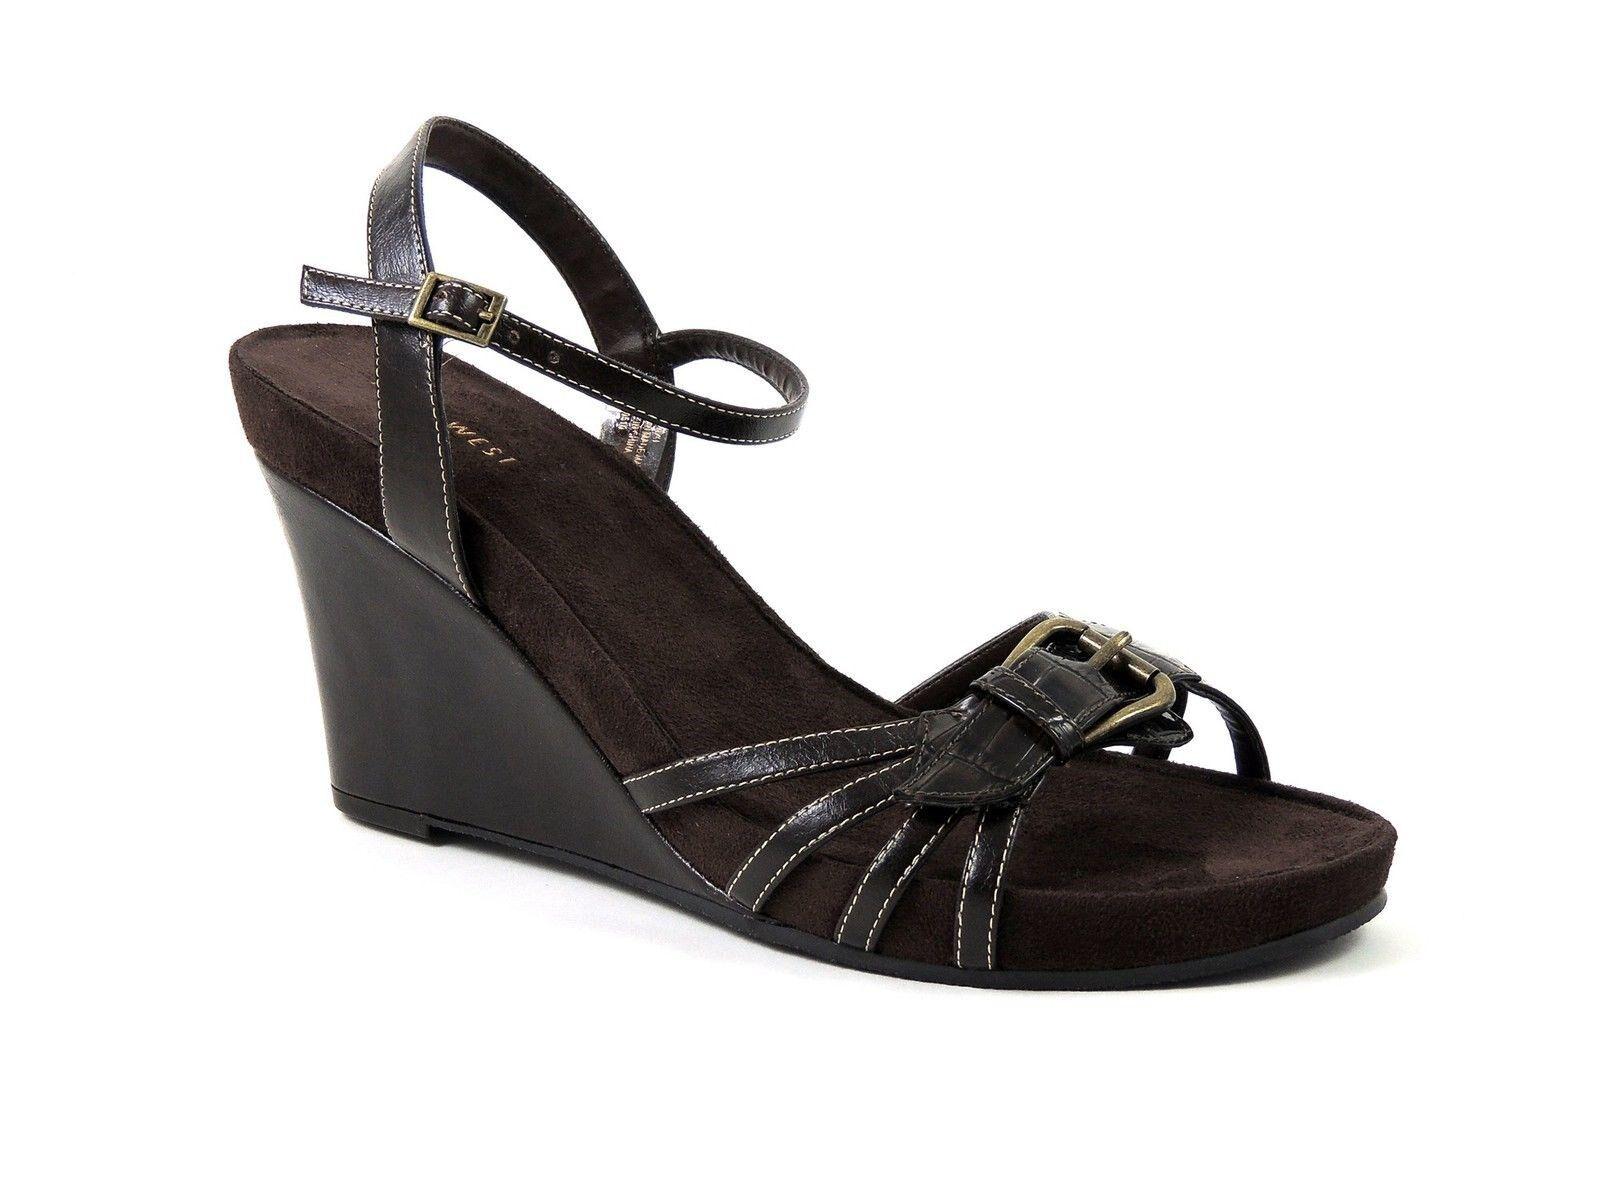 Nine West Women's Ardijanazu Wedge Sandals Brown Size 11 M